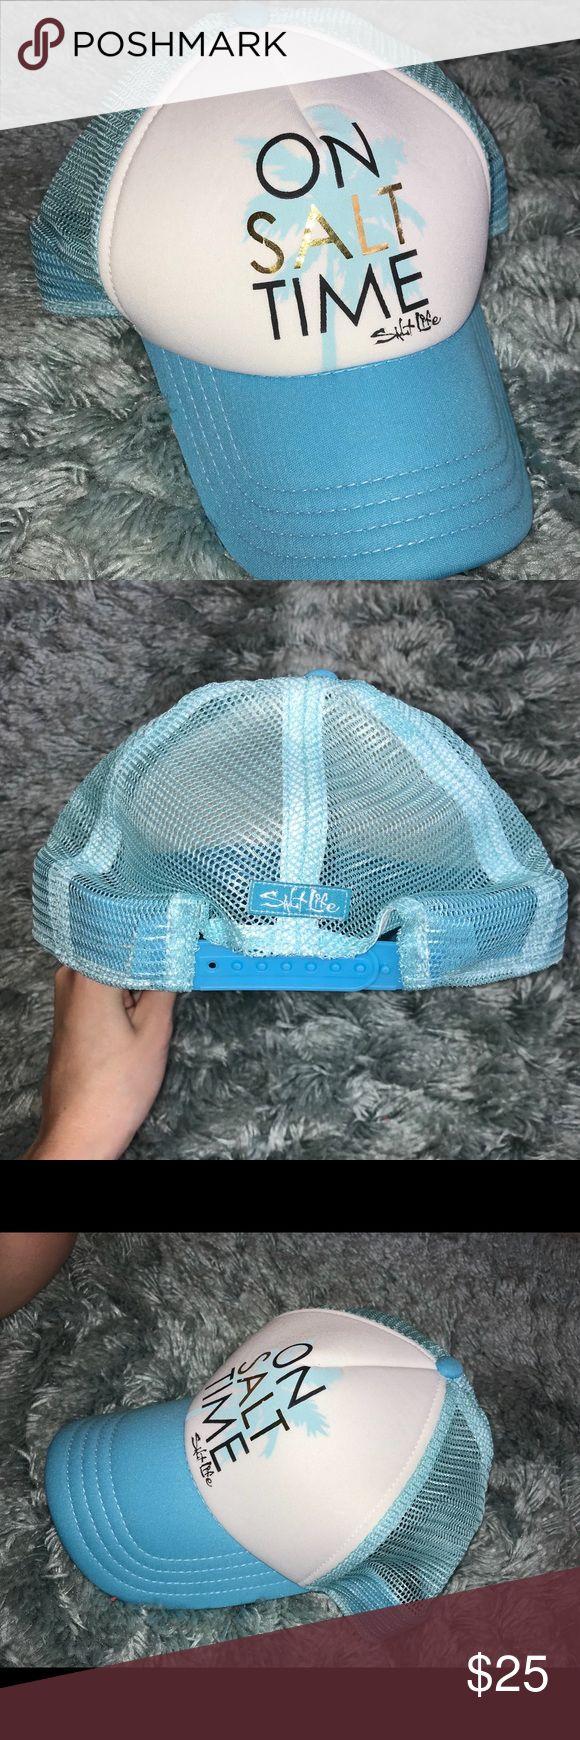 Salt Life Hat Never worn, brand new condition! Salt Life Accessories Hats